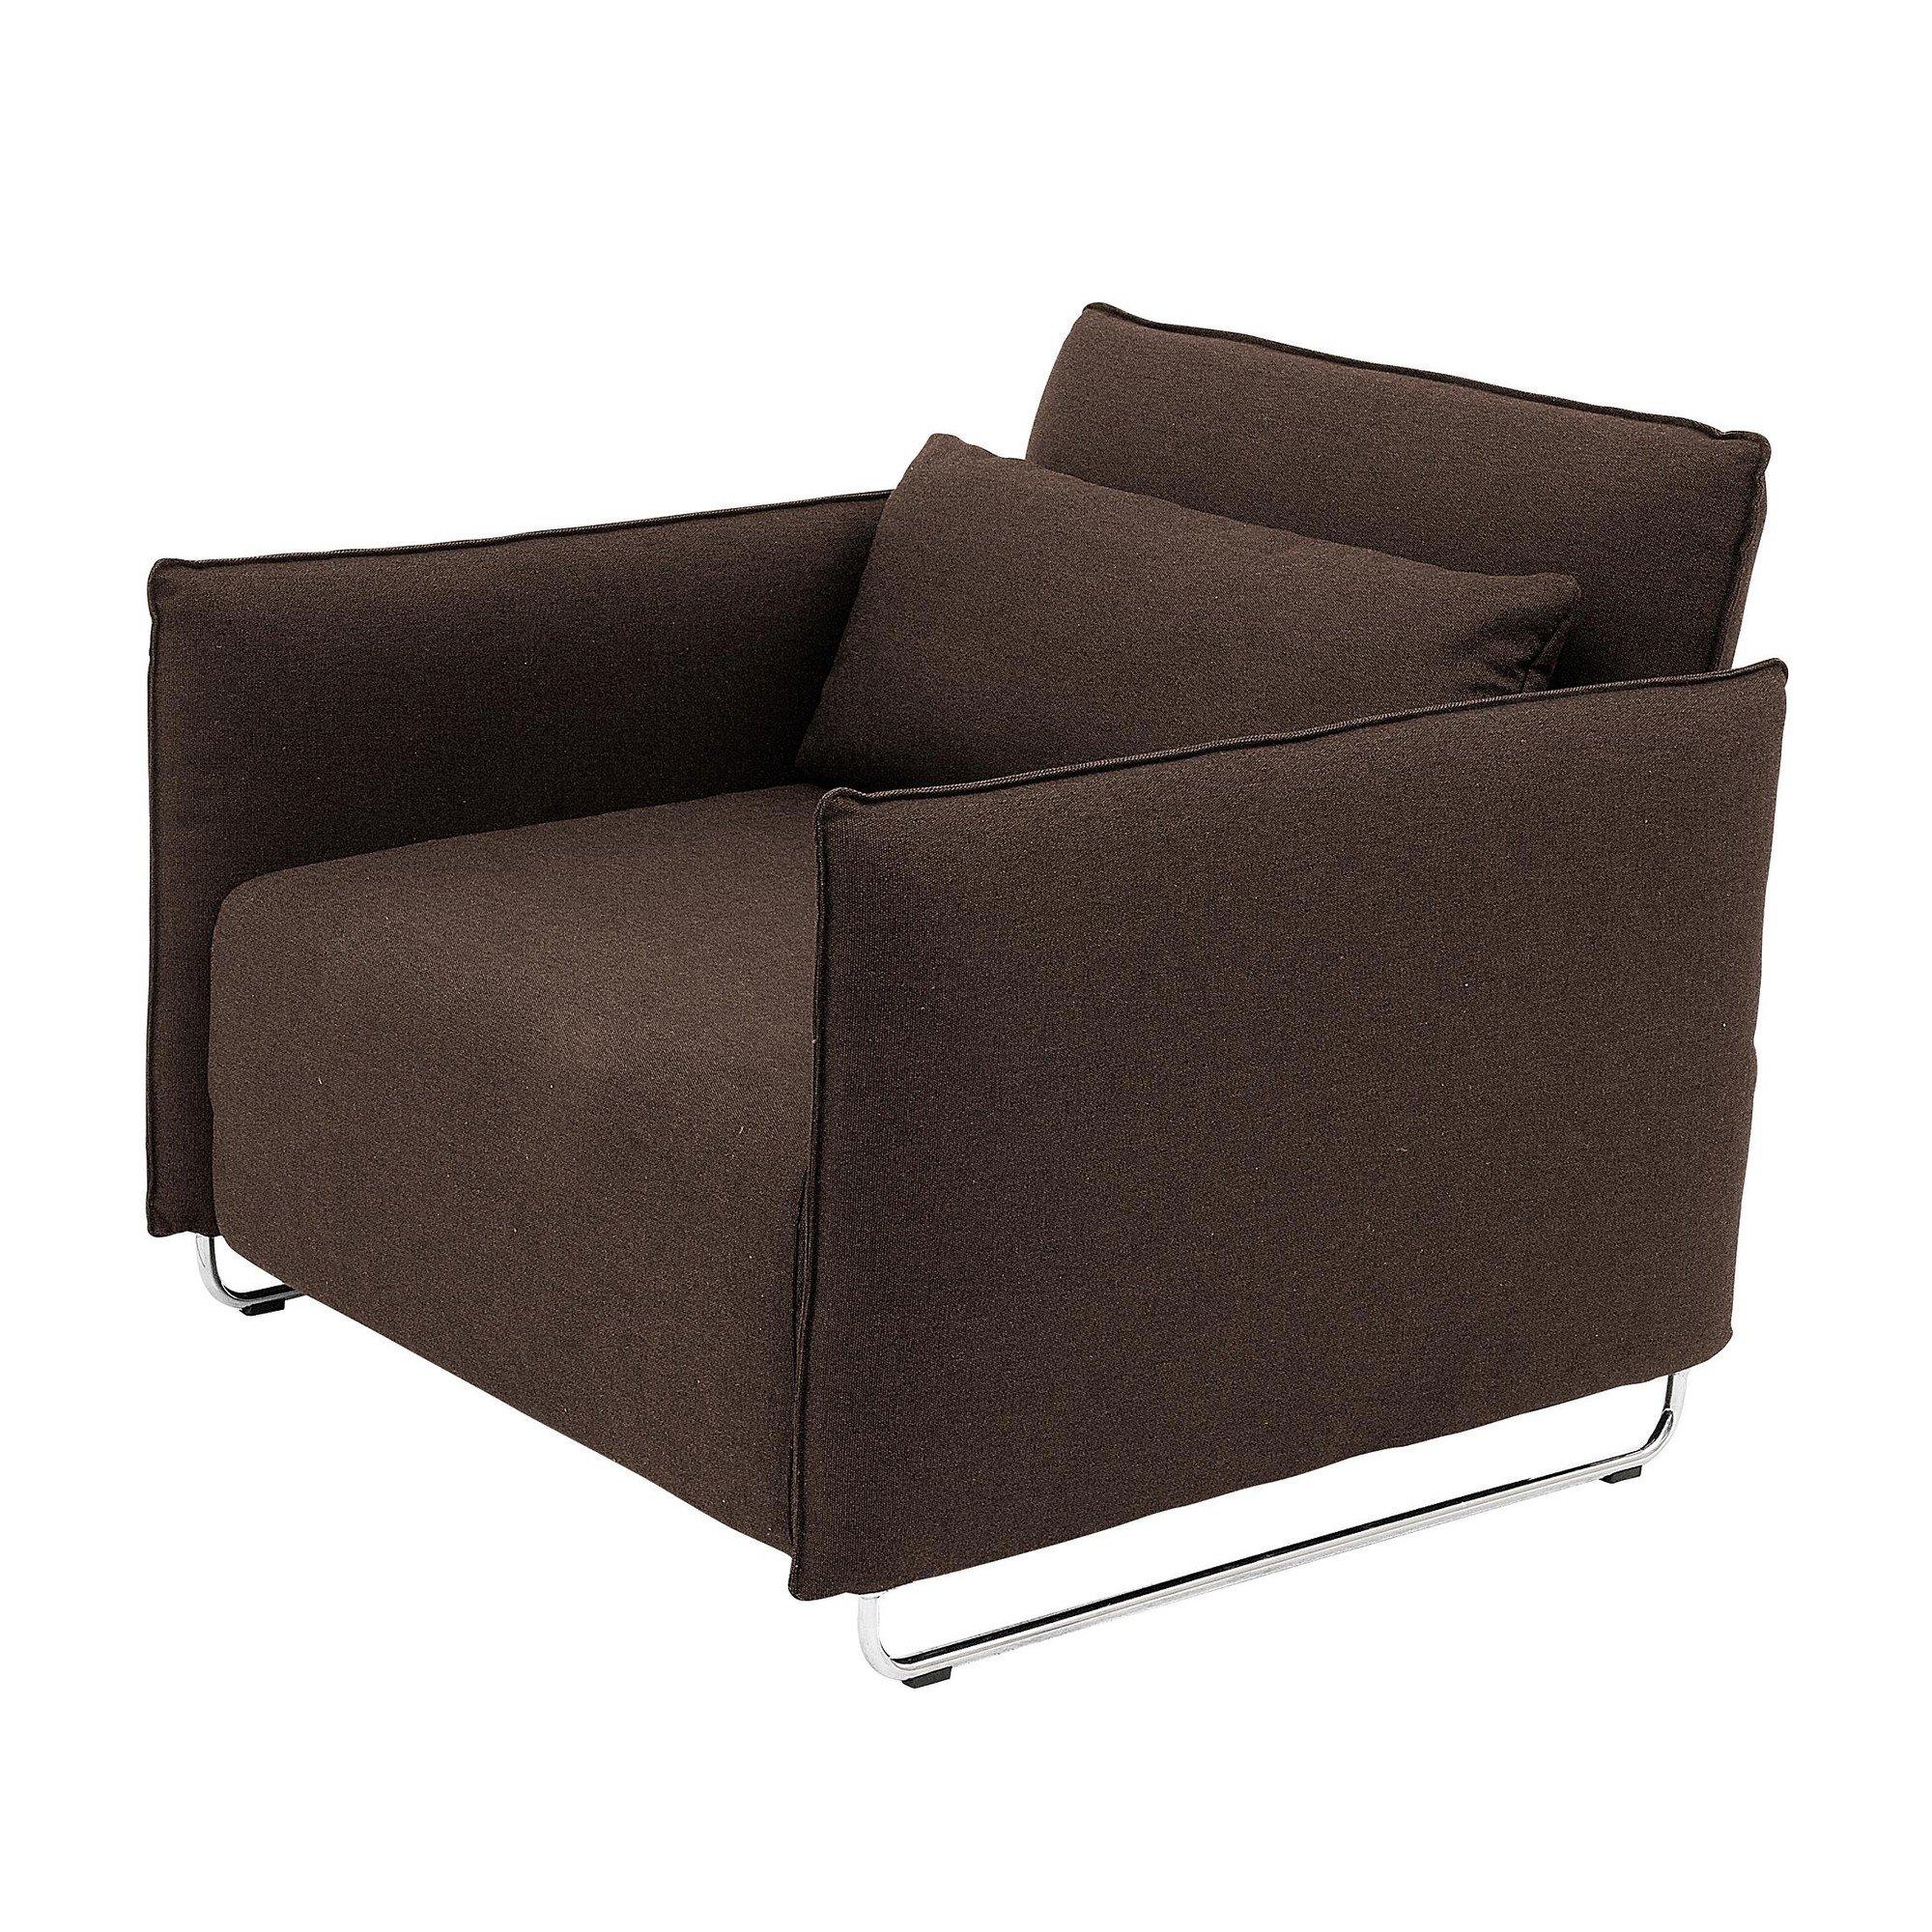 Softline cord sessel schlafsessel ambientedirect for Slaap stoel